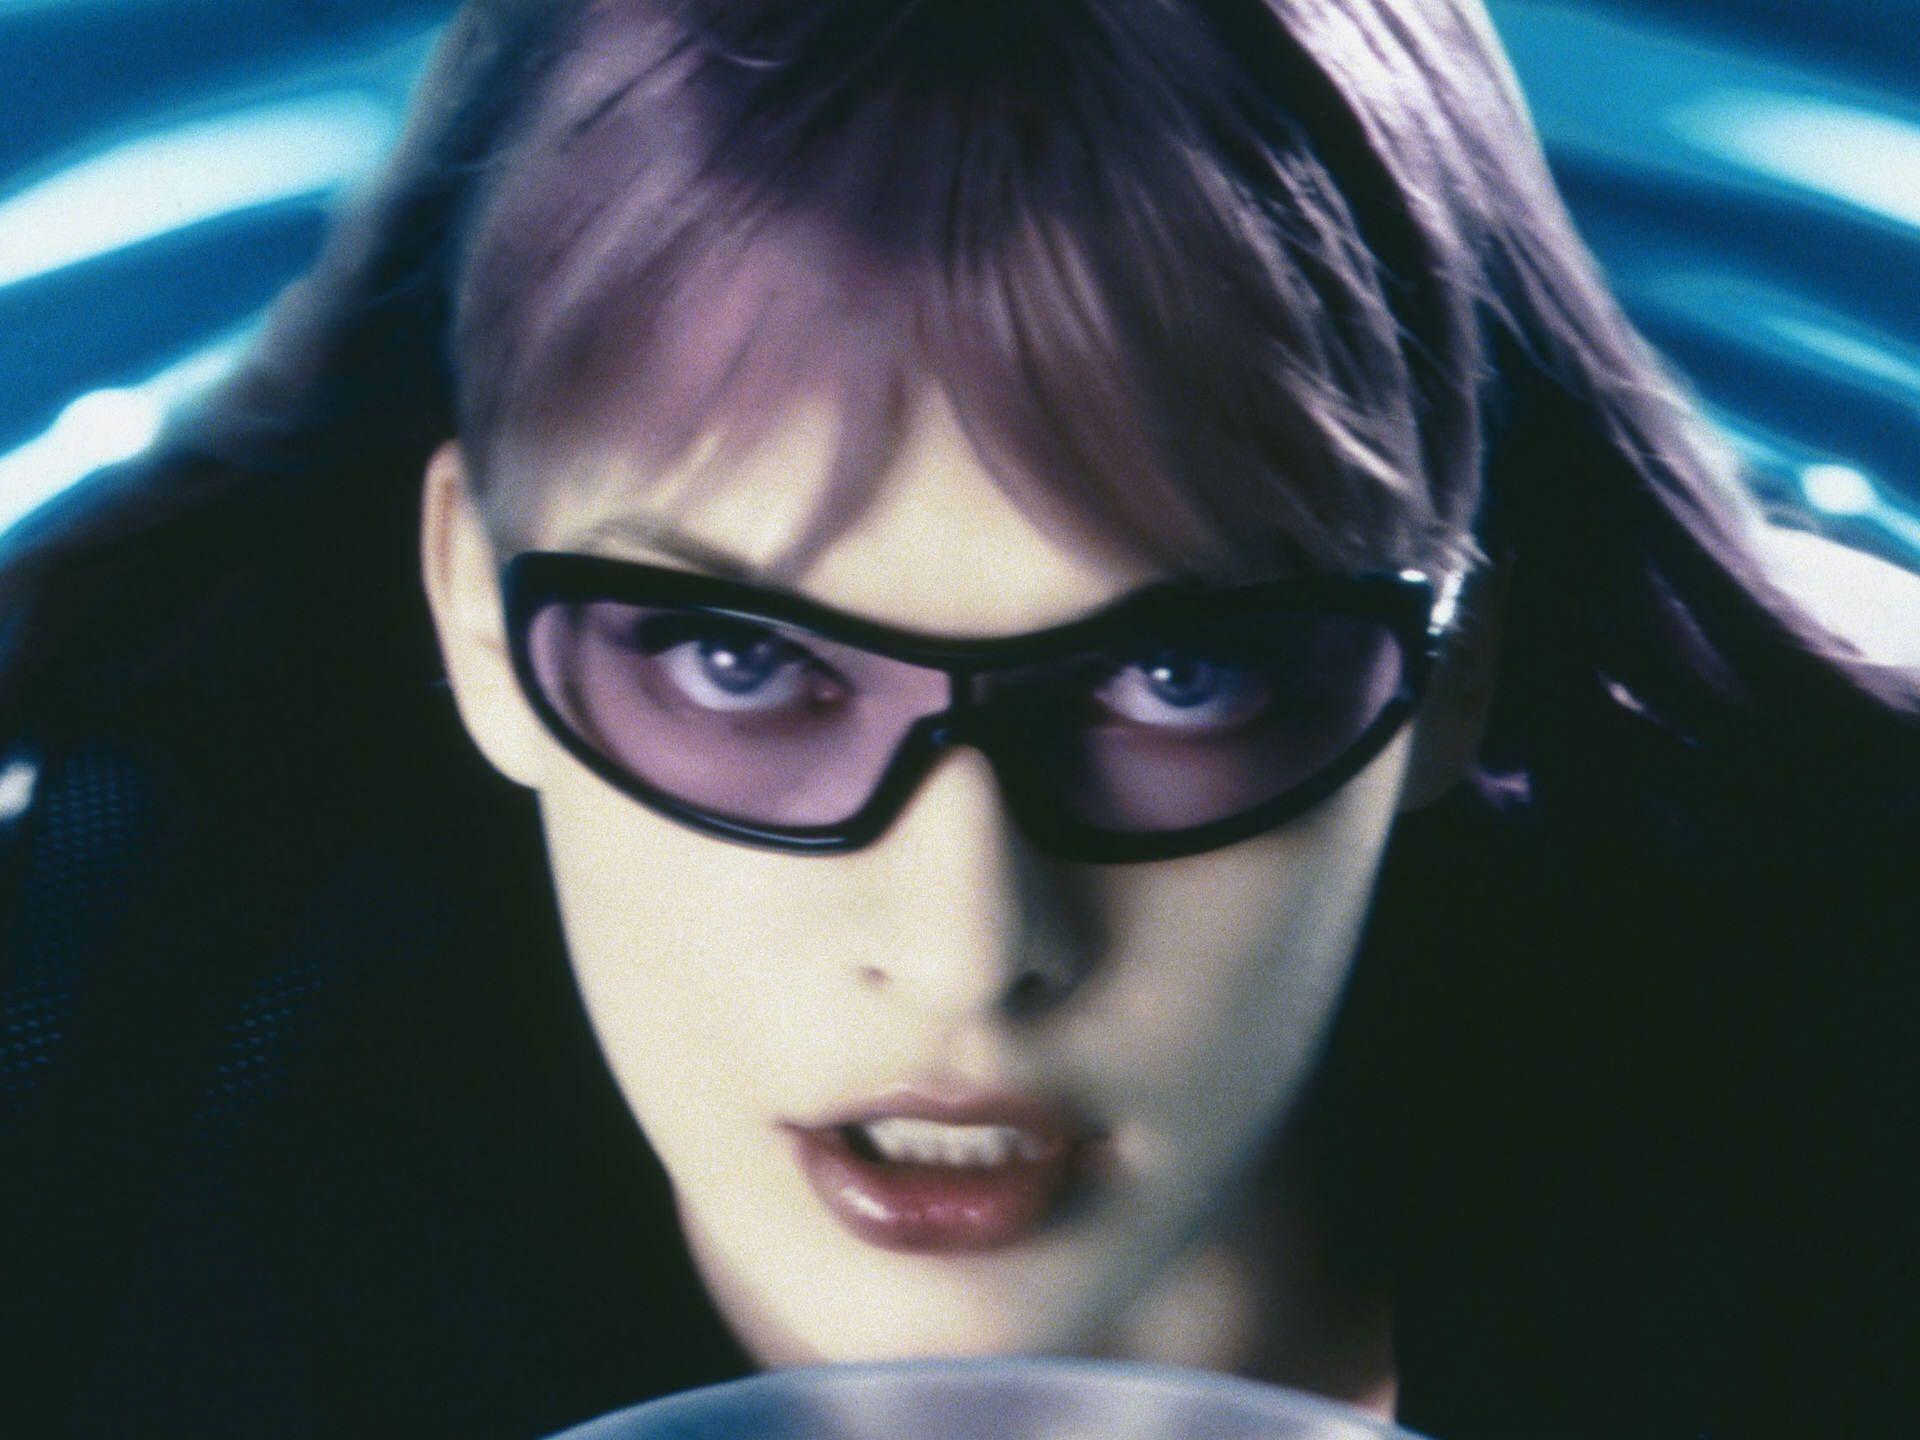 Ultraviolet movie music